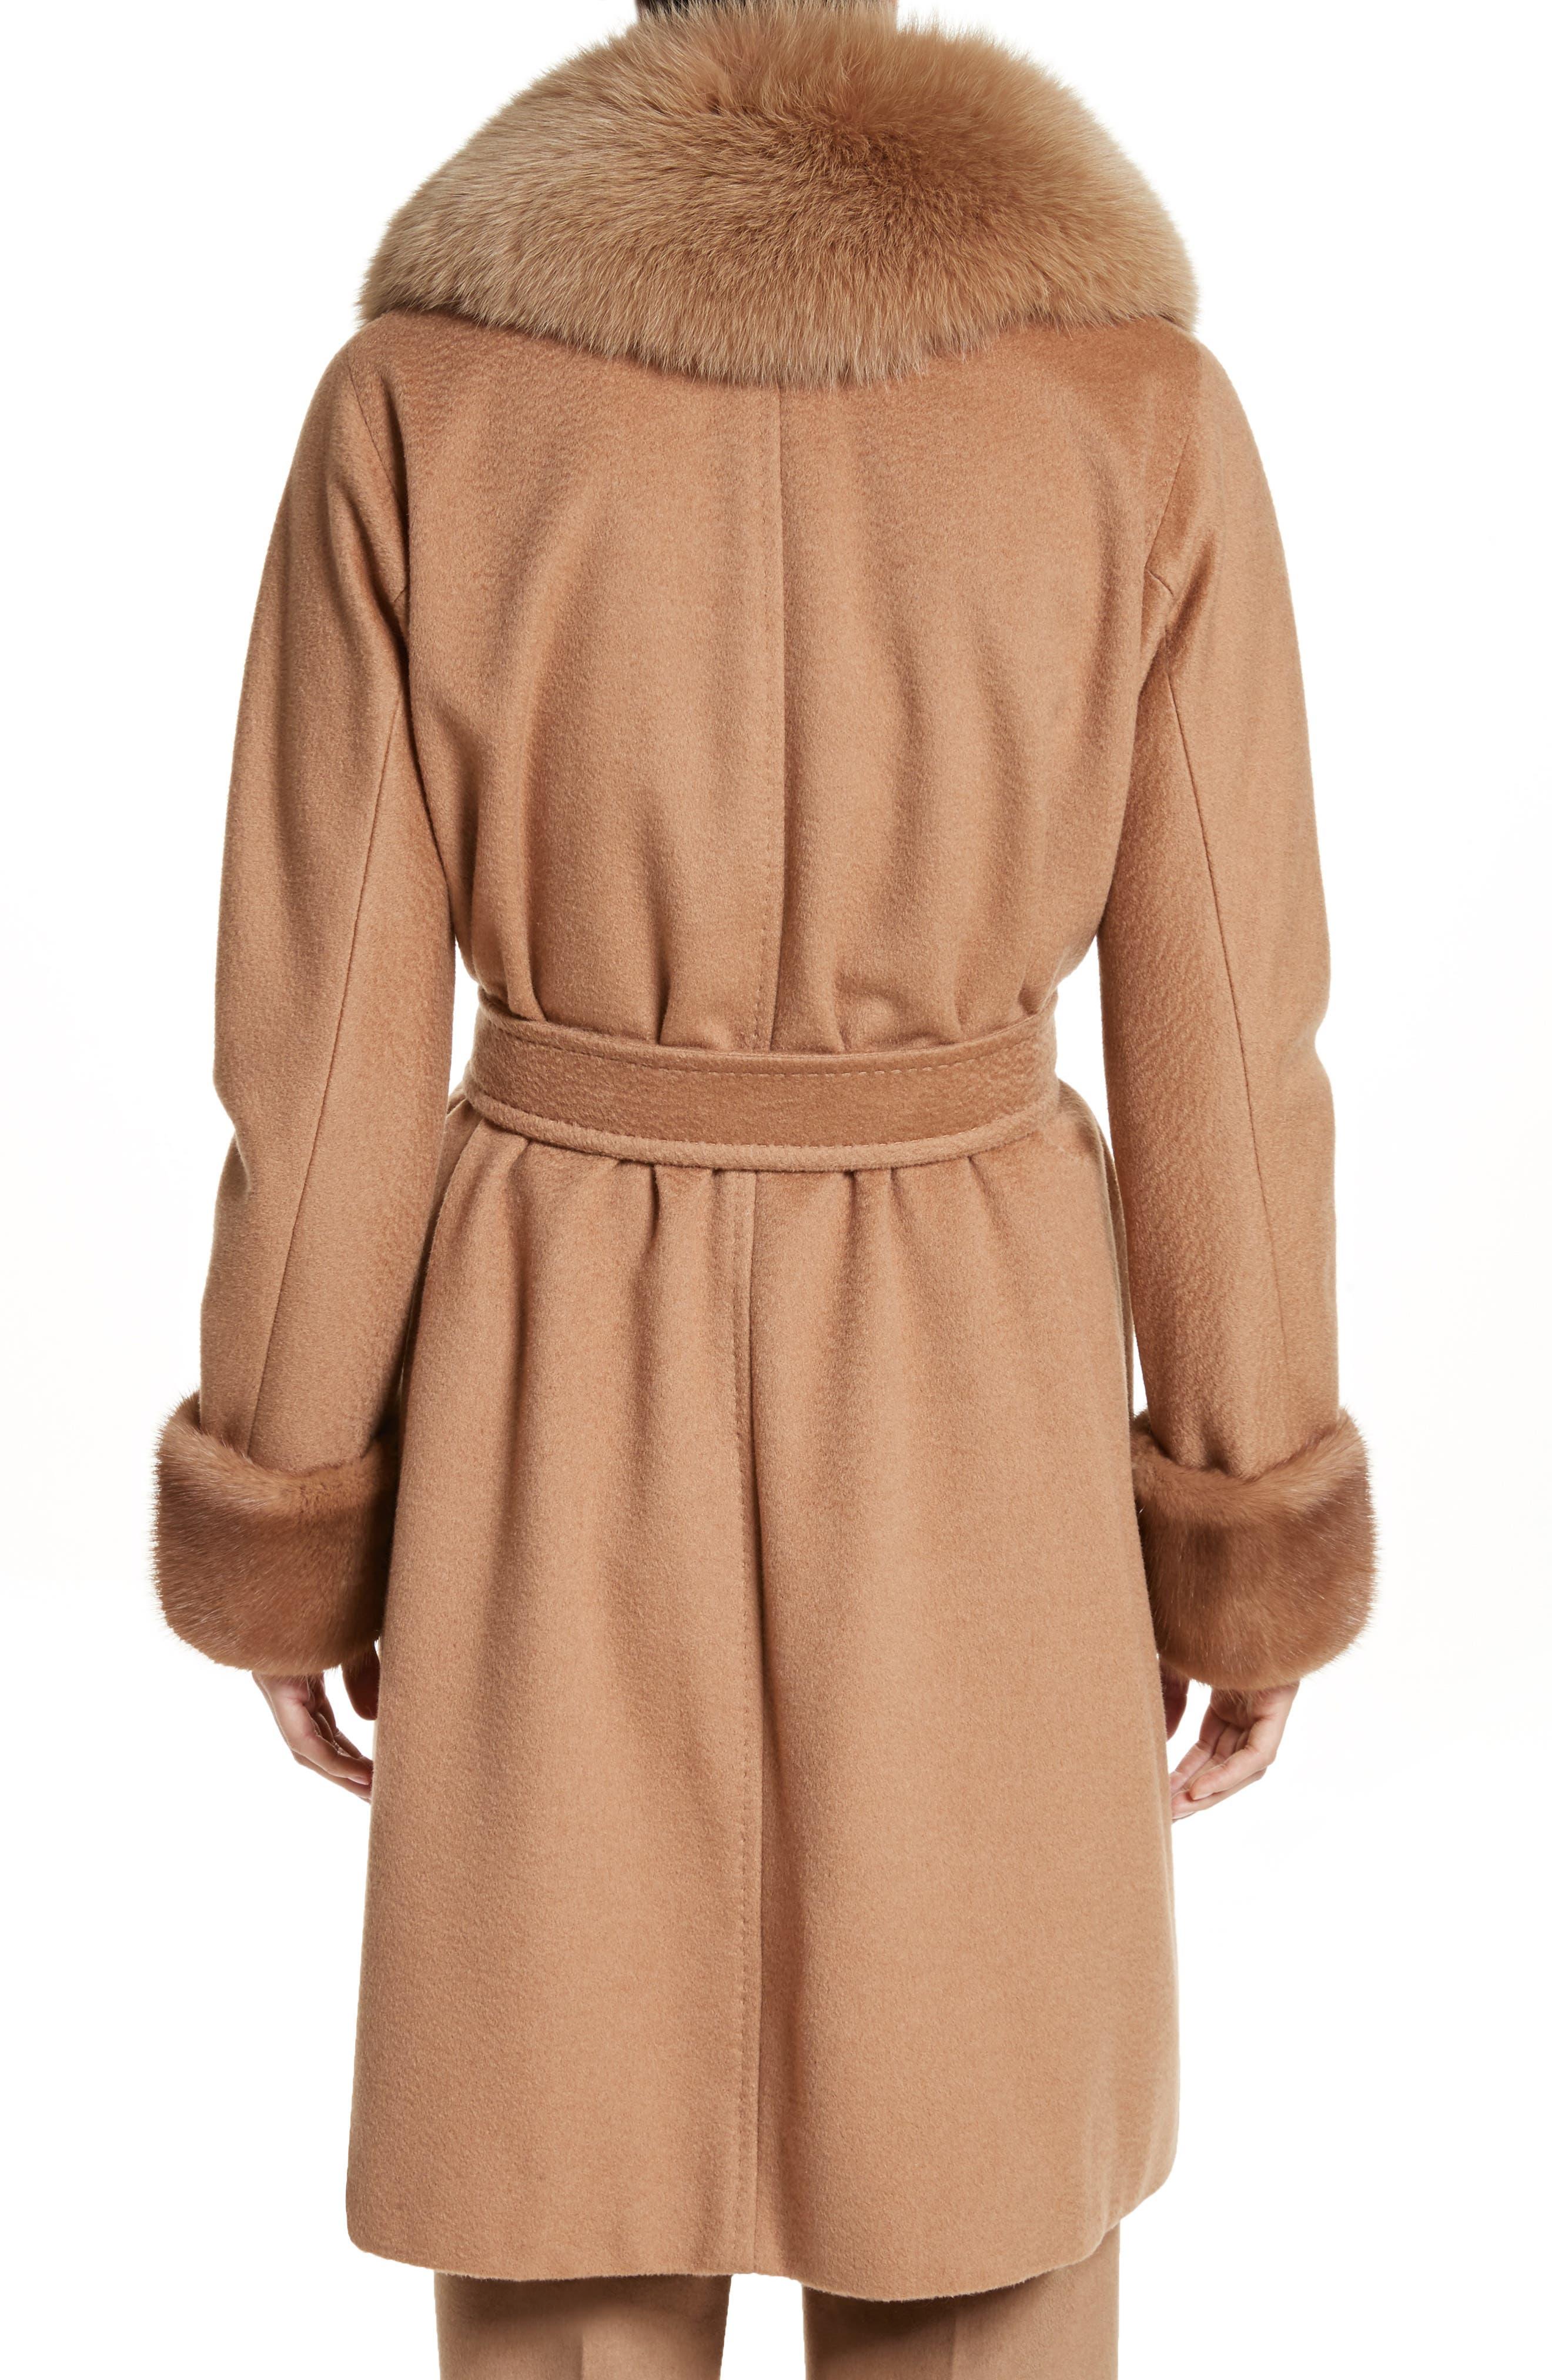 Camel Hair Coat with Genuine Fox Fur & Genuine Mink Fur Trim,                             Alternate thumbnail 2, color,                             232